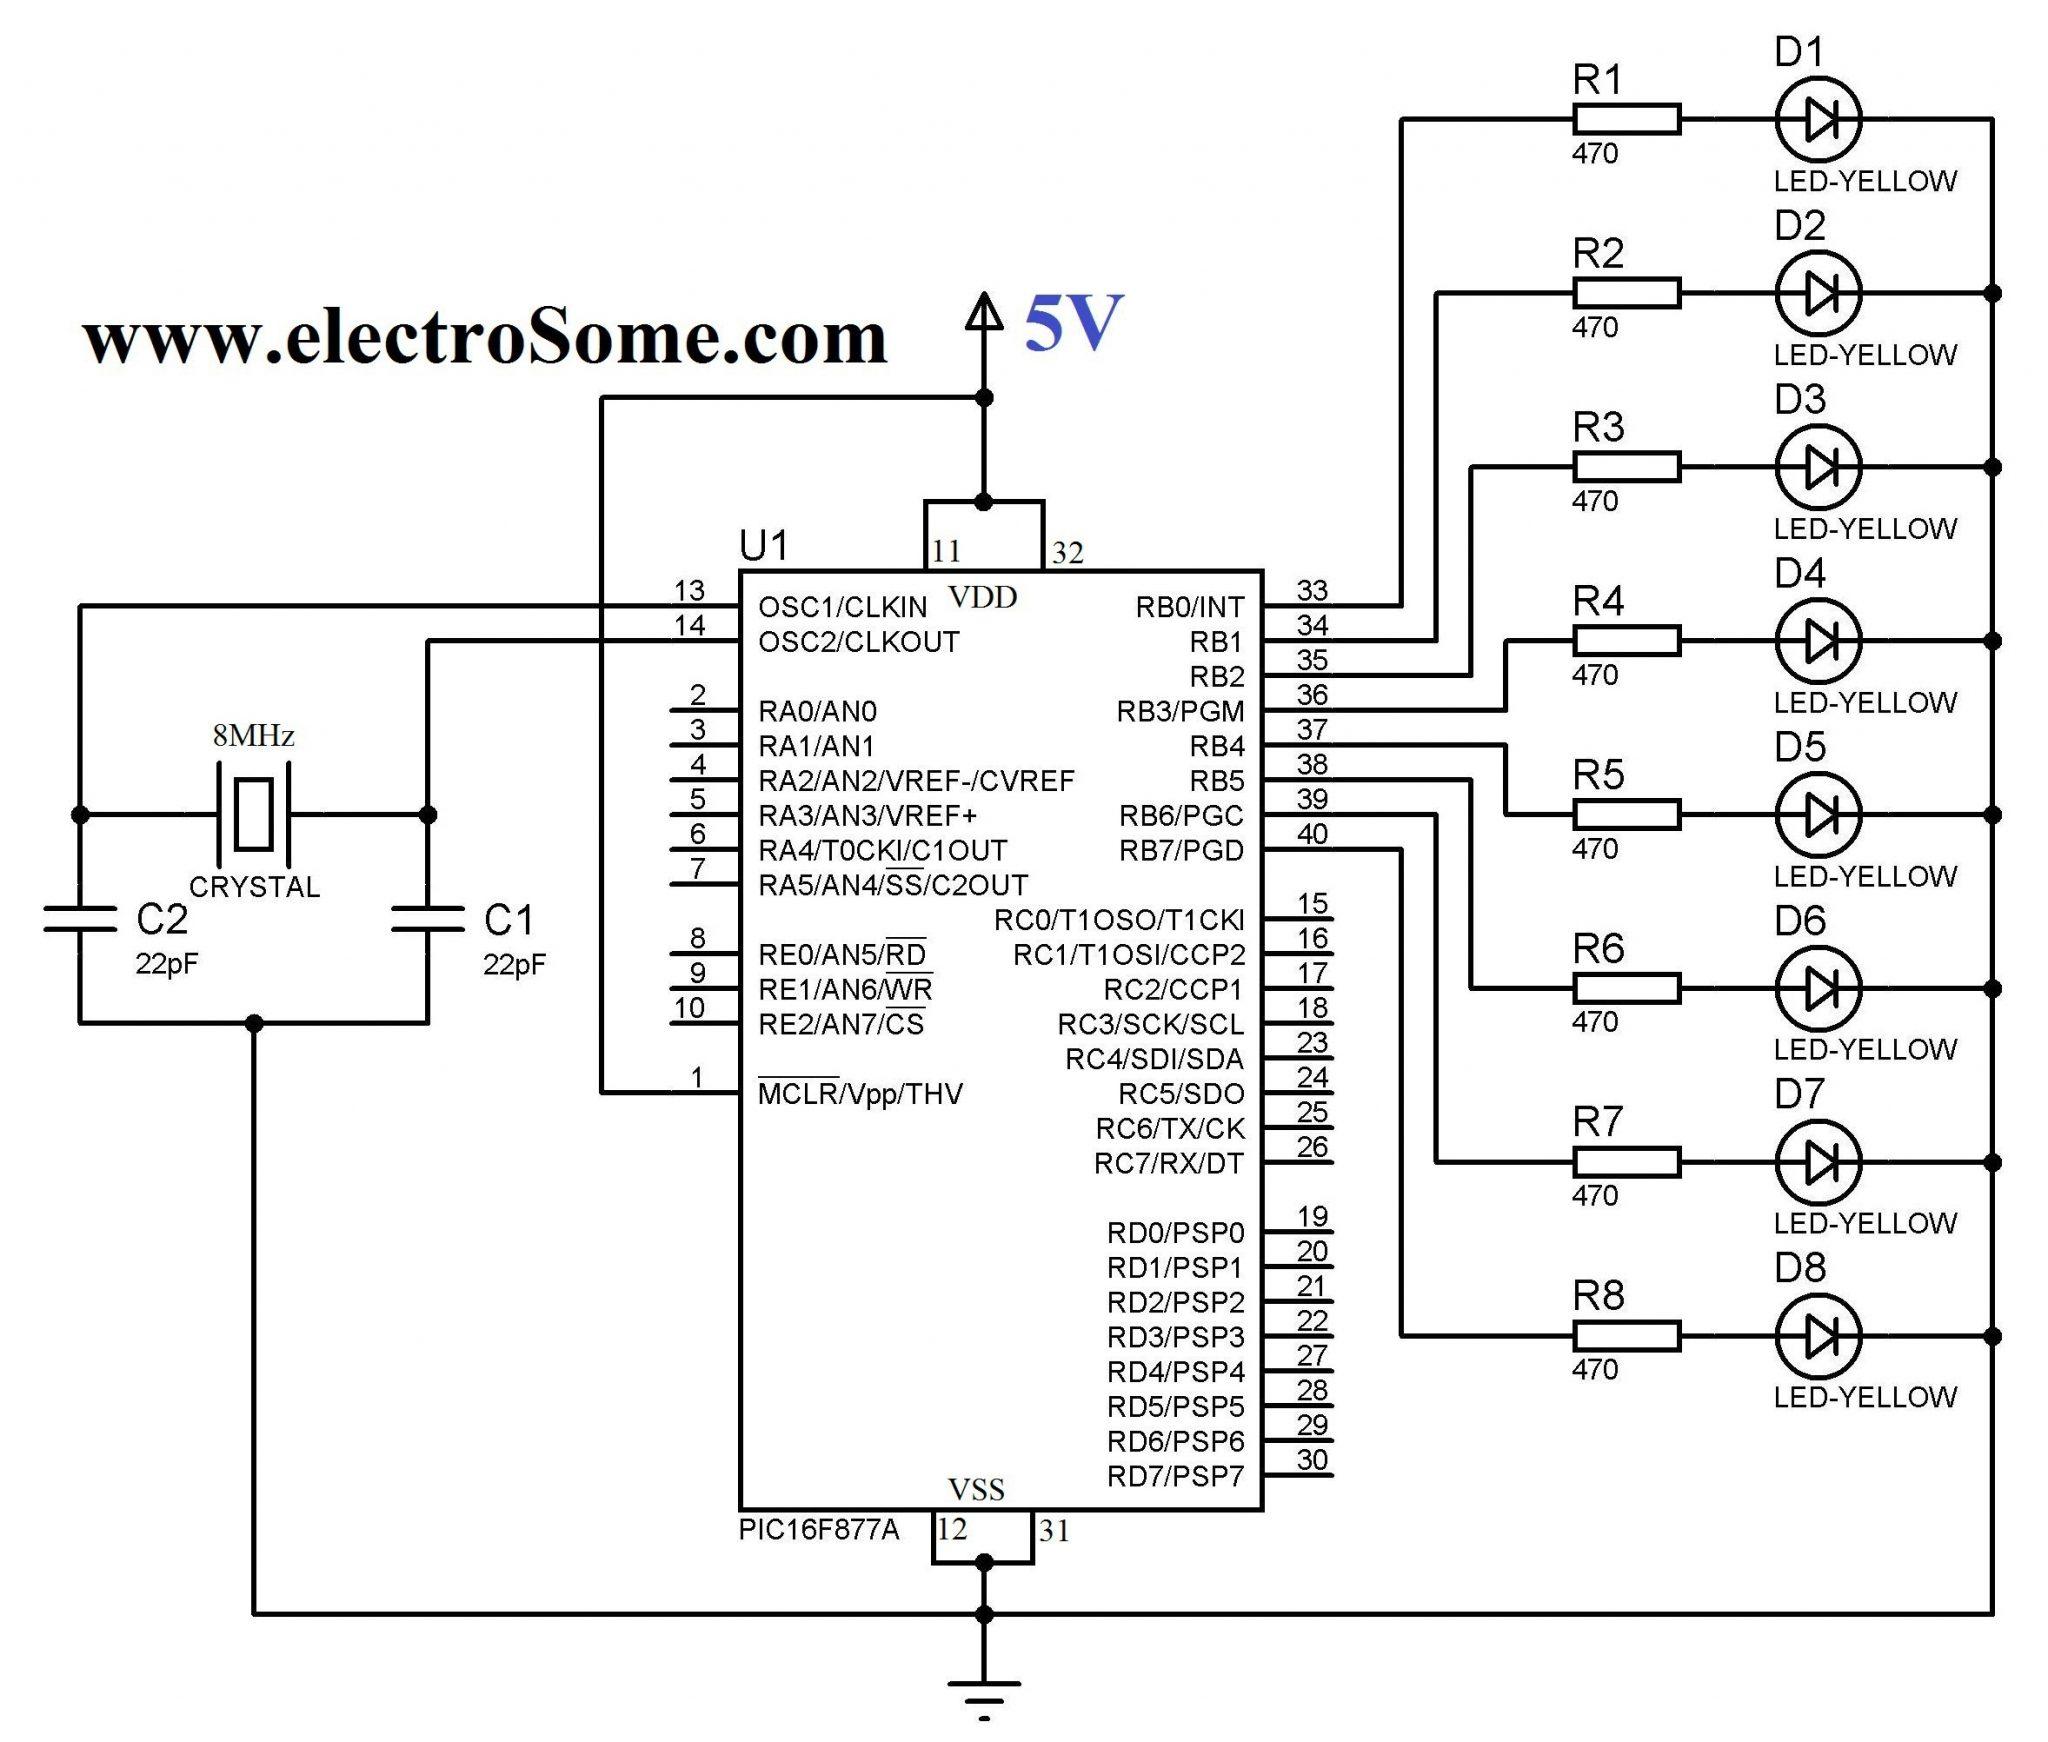 11 Pin Cube Relay Wiring Diagram Blinking Led Using Pic Microcontroller Hi Tech C